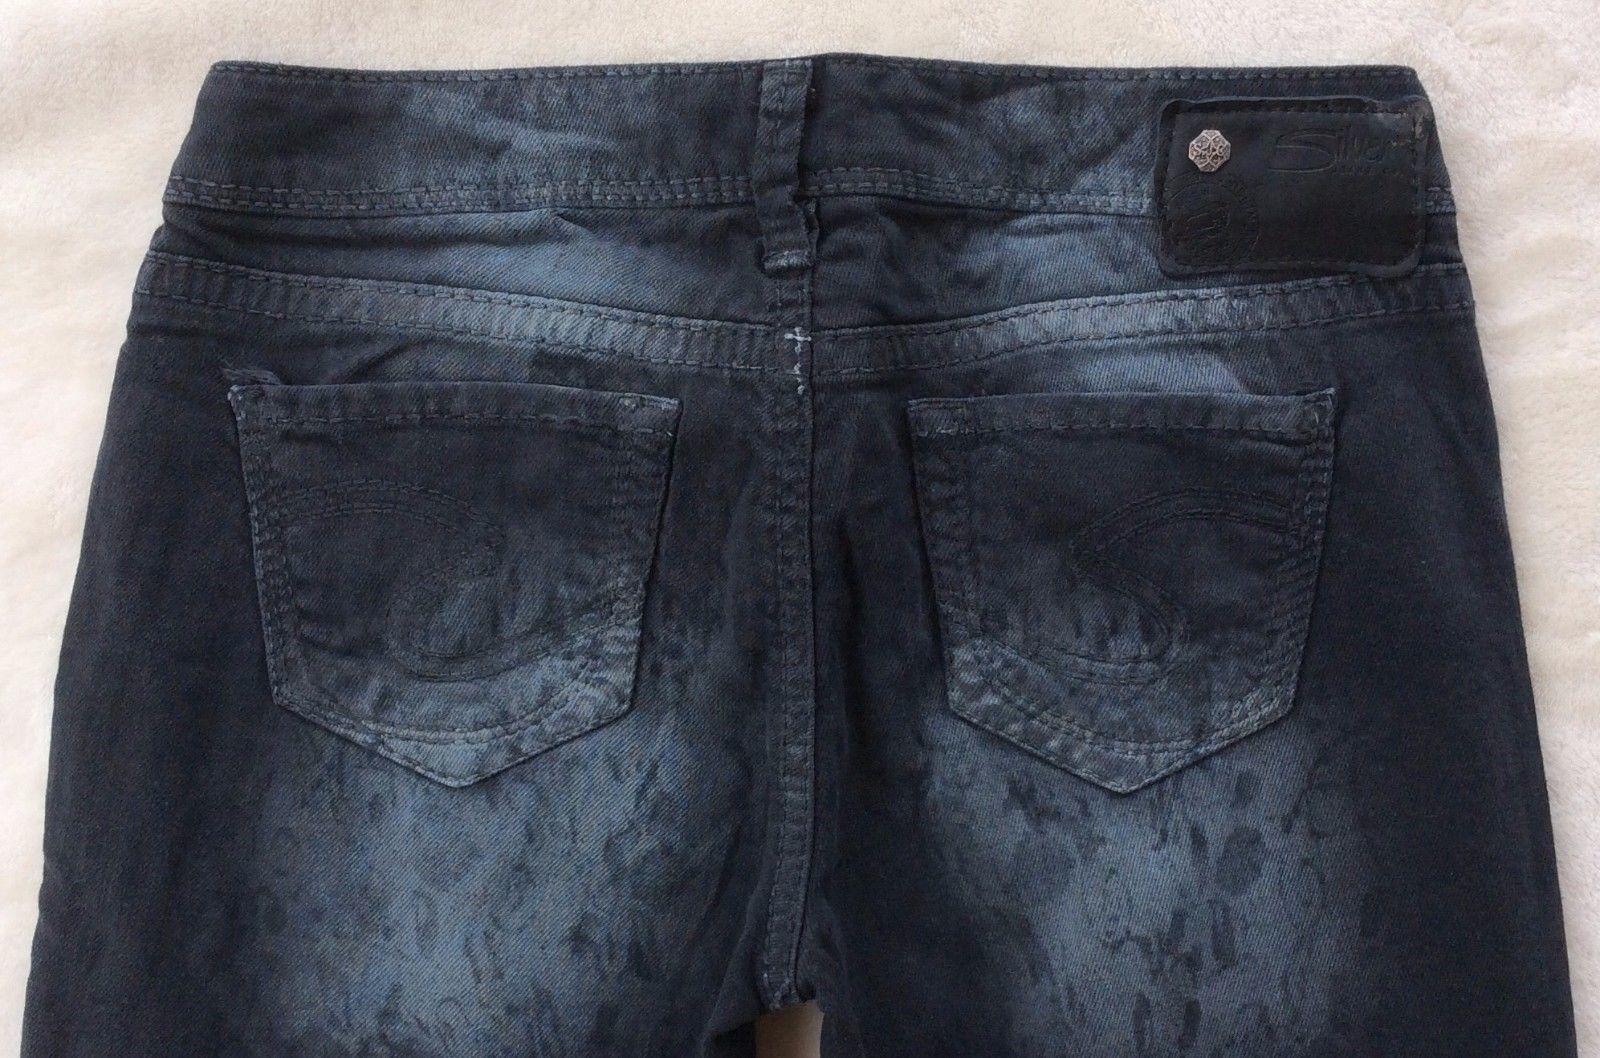 e6630b6a S l1600. S l1600. Previous. New SILVER Jeans Sale Buckle Printed Aiko  Skinny Black Grey Stretch Jean ...